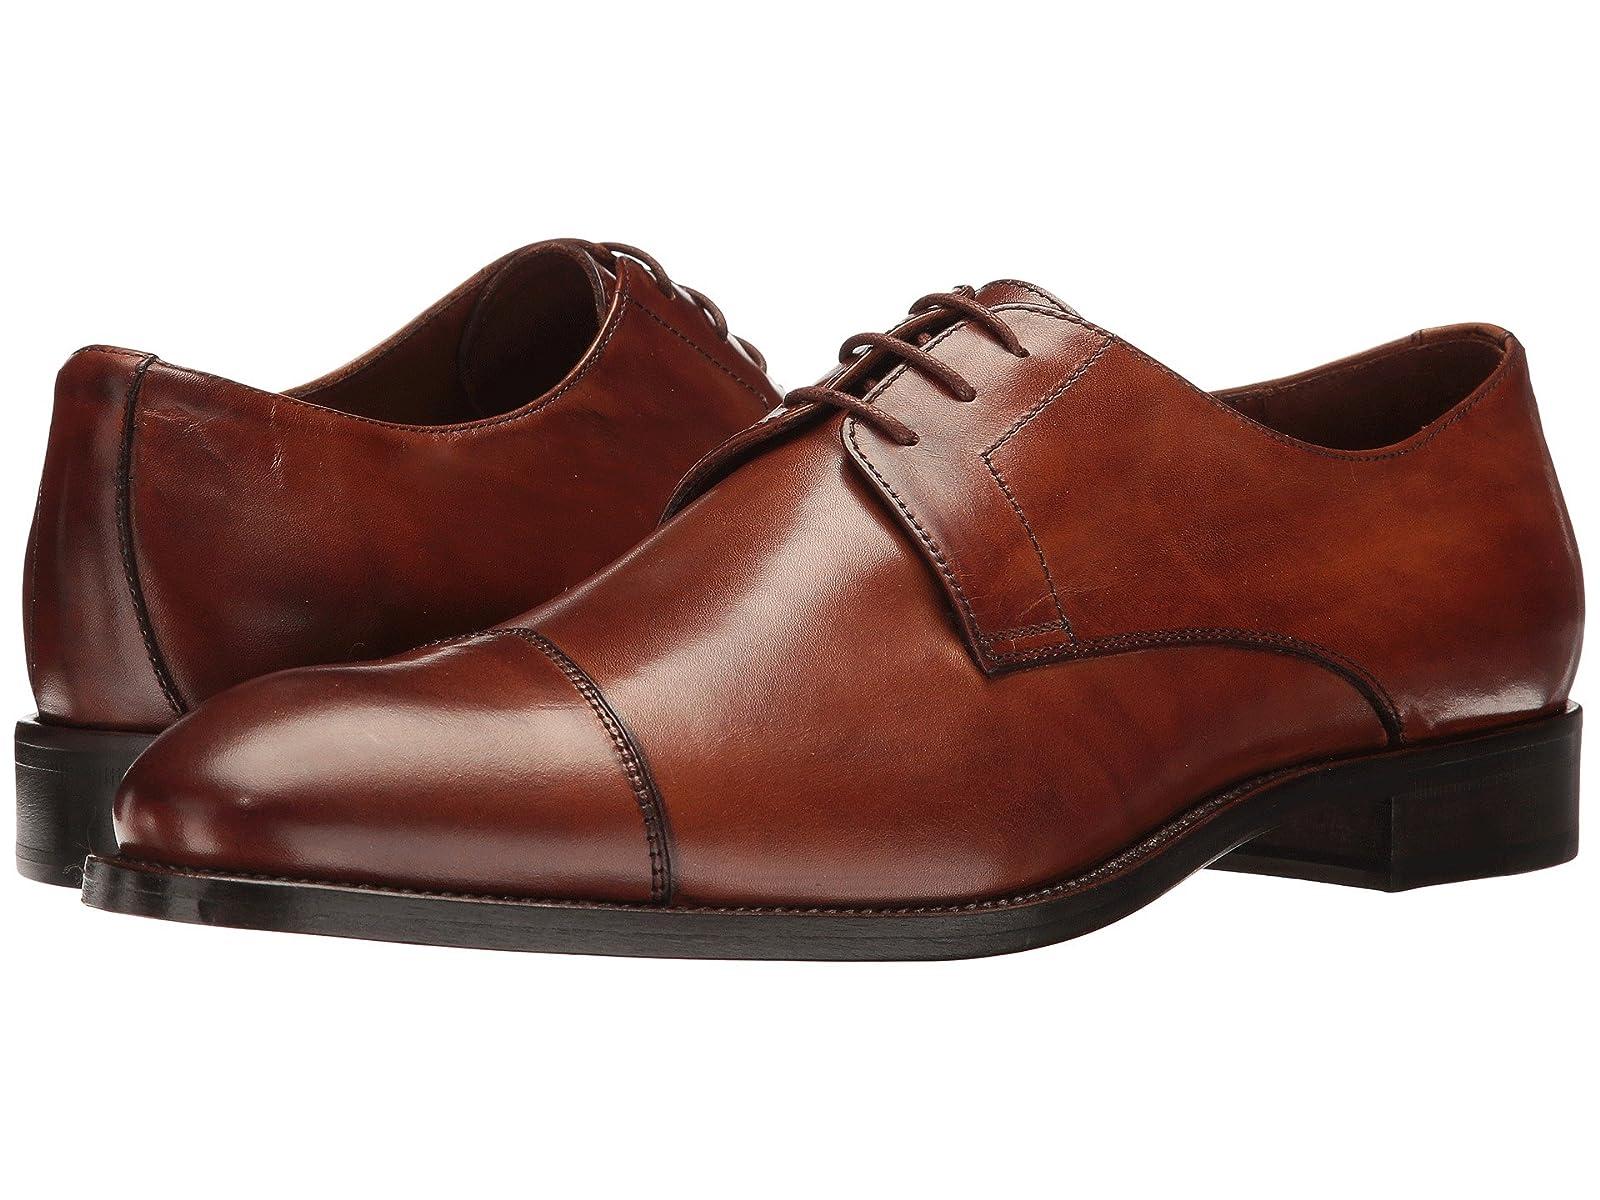 Massimo Matteo 3-Eye Cap BlucherAtmospheric grades have affordable shoes